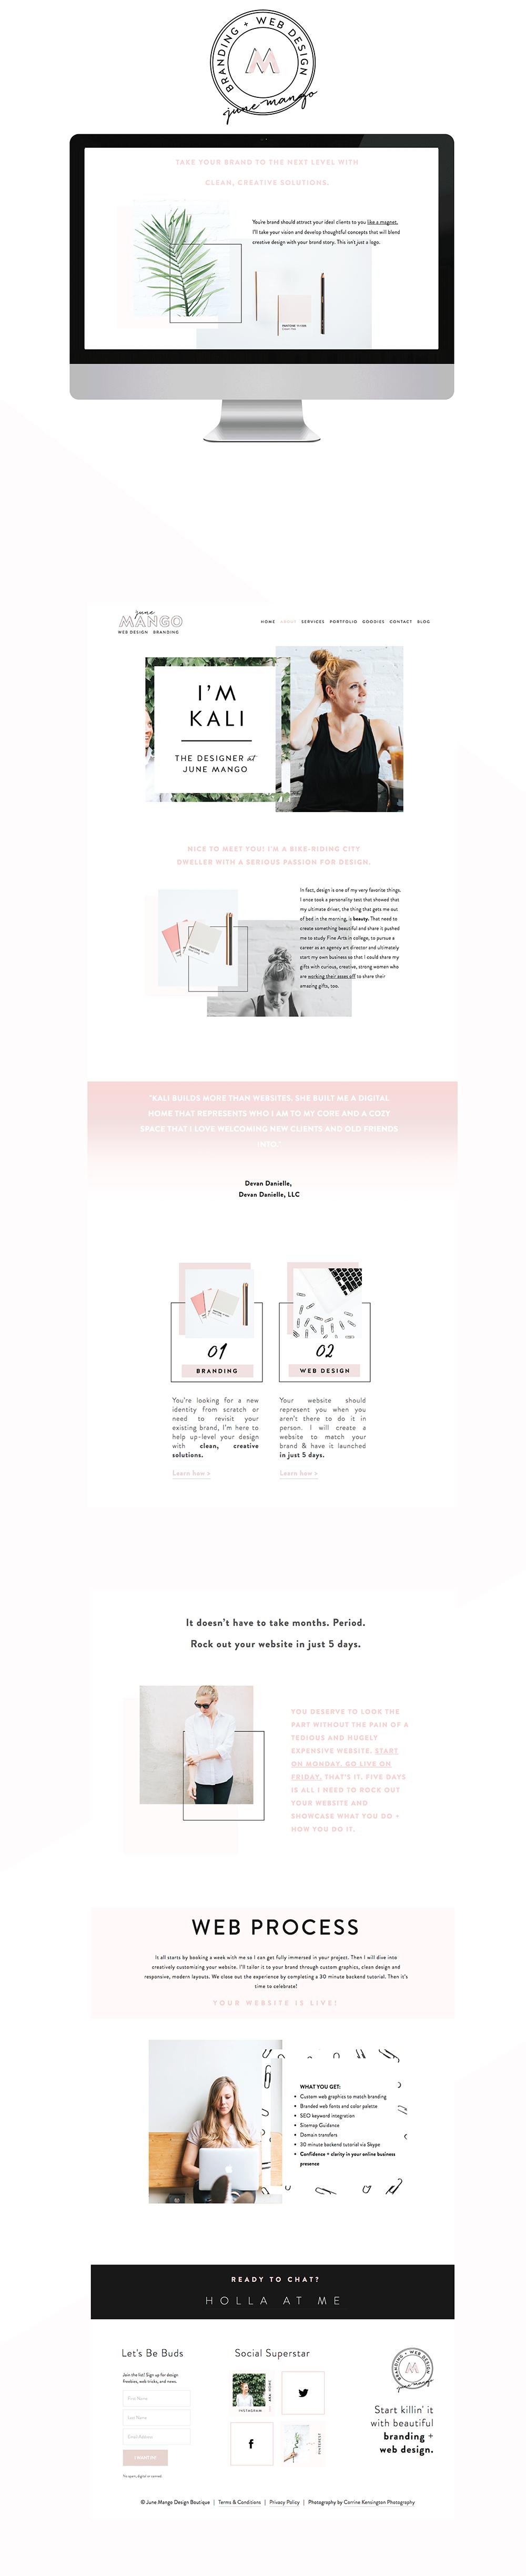 Feminine-Web-Design-June-Mango-27.png